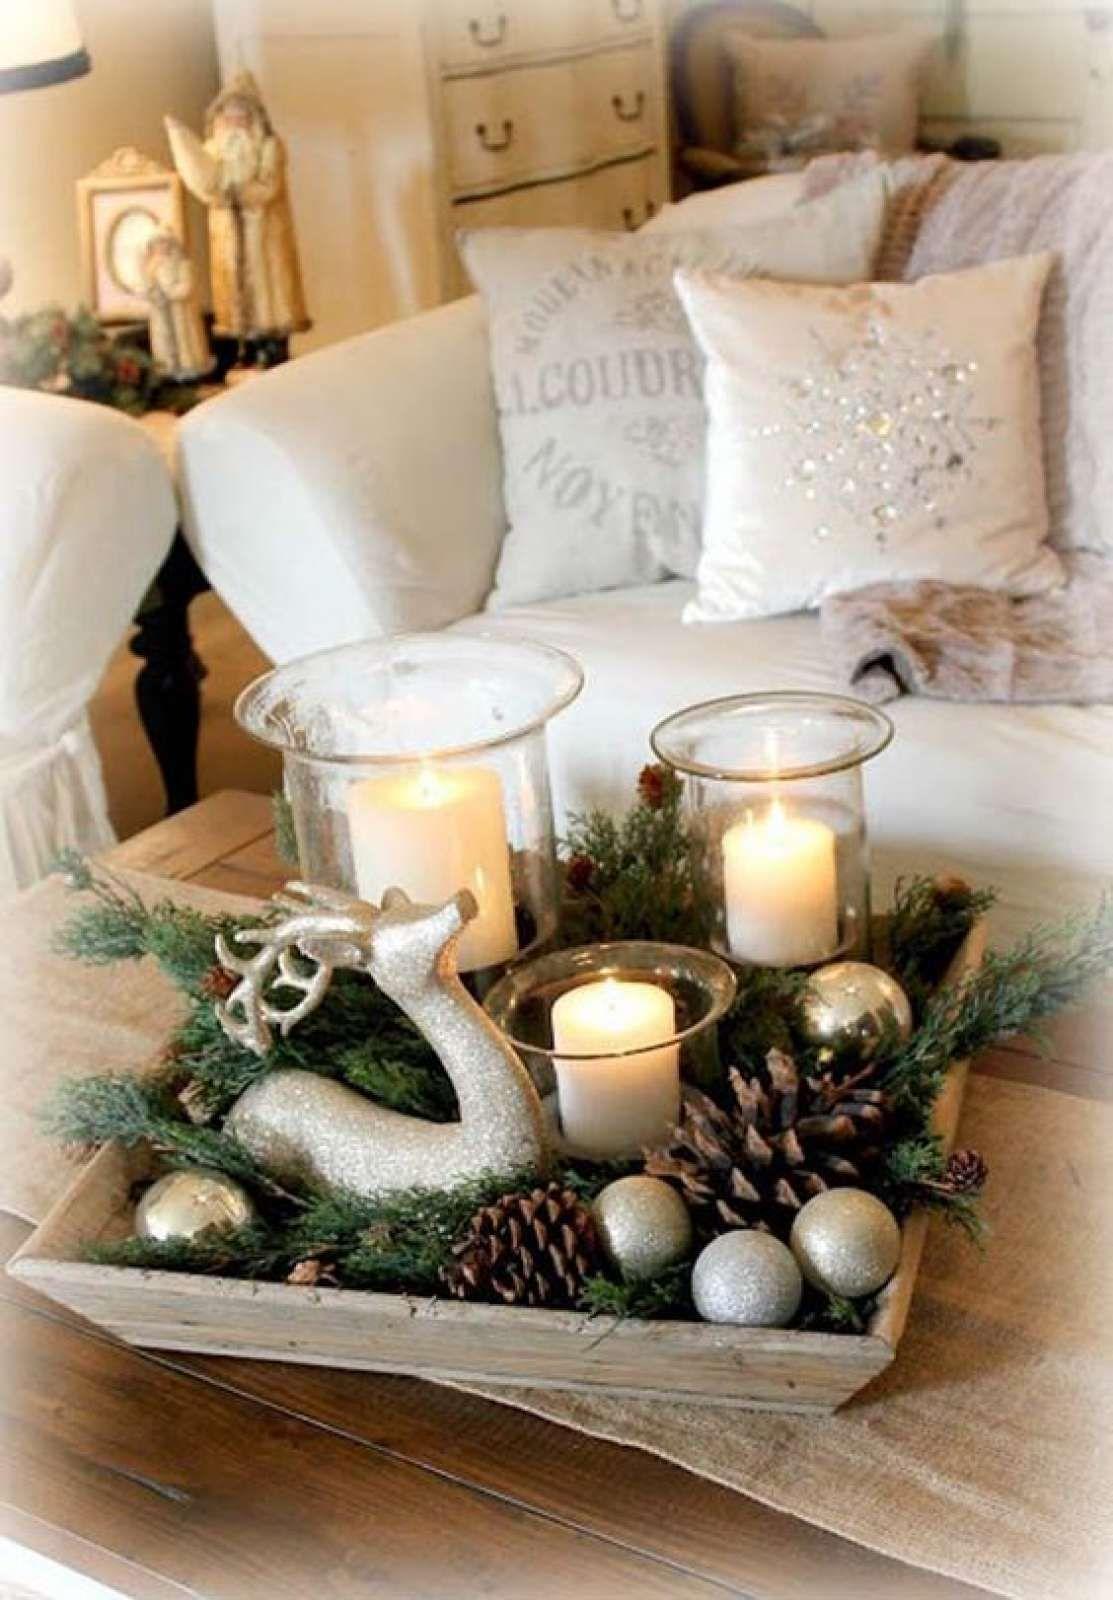 reindeer coffee table centerpiece coffee table christmas decor christmas centerpieces for table christmas coffee